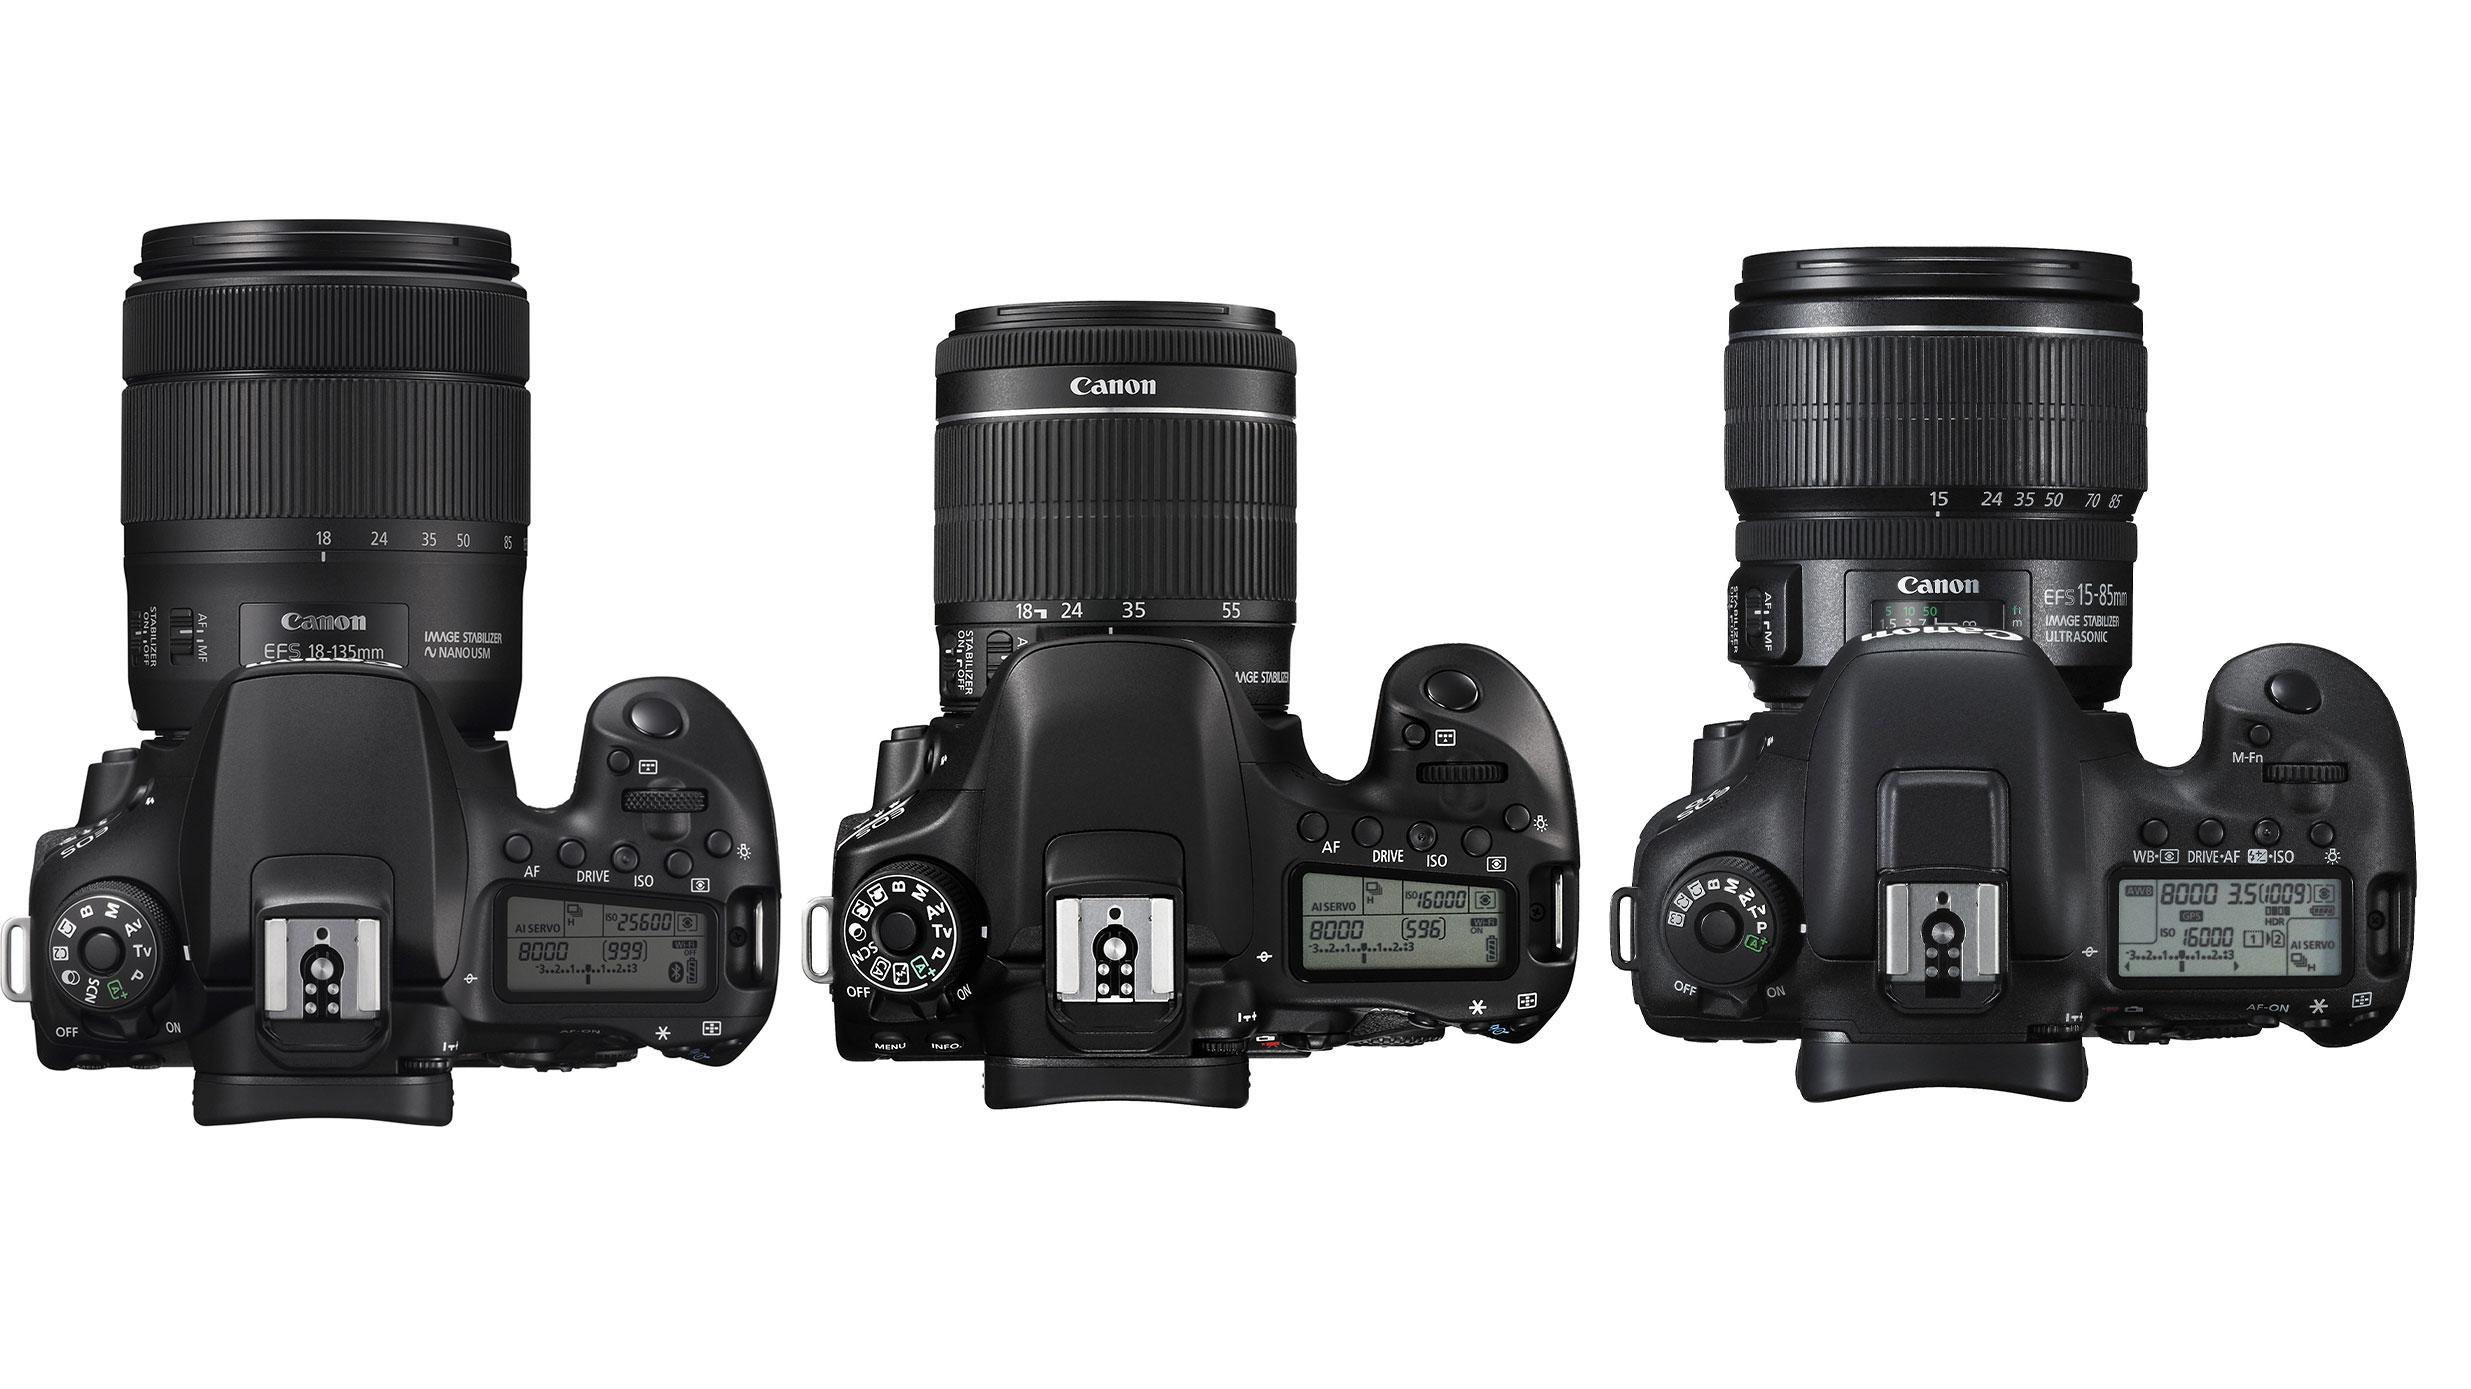 Canon EOS 90D vs EOS 80D vs EOS 7D Mark II: 12 key differences | Digital Camera World